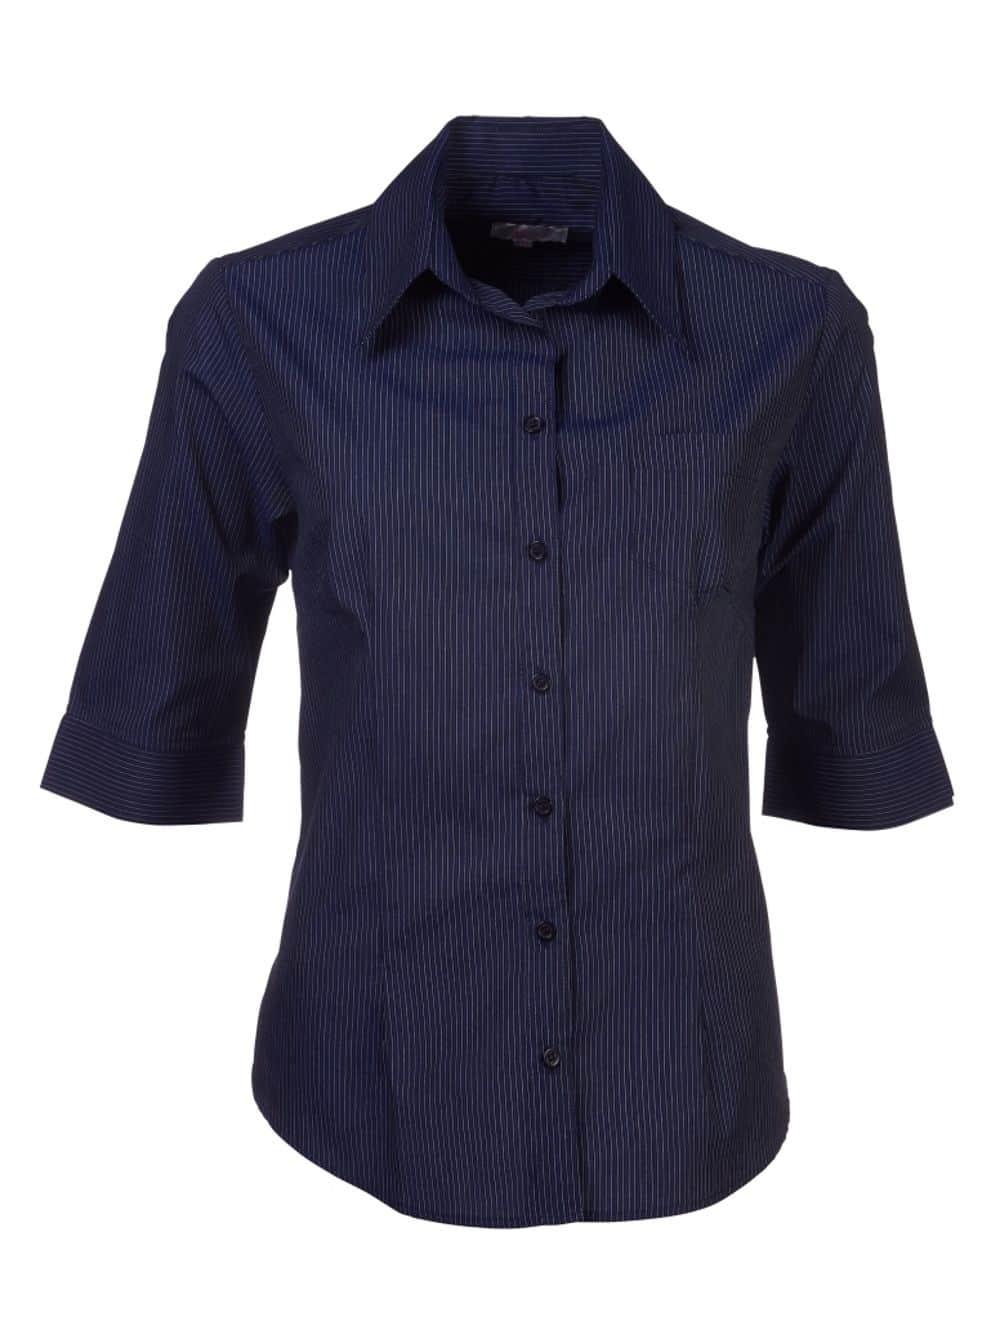 3/4 K122 Jacqui Blouse Lounge Shirts and Blouses